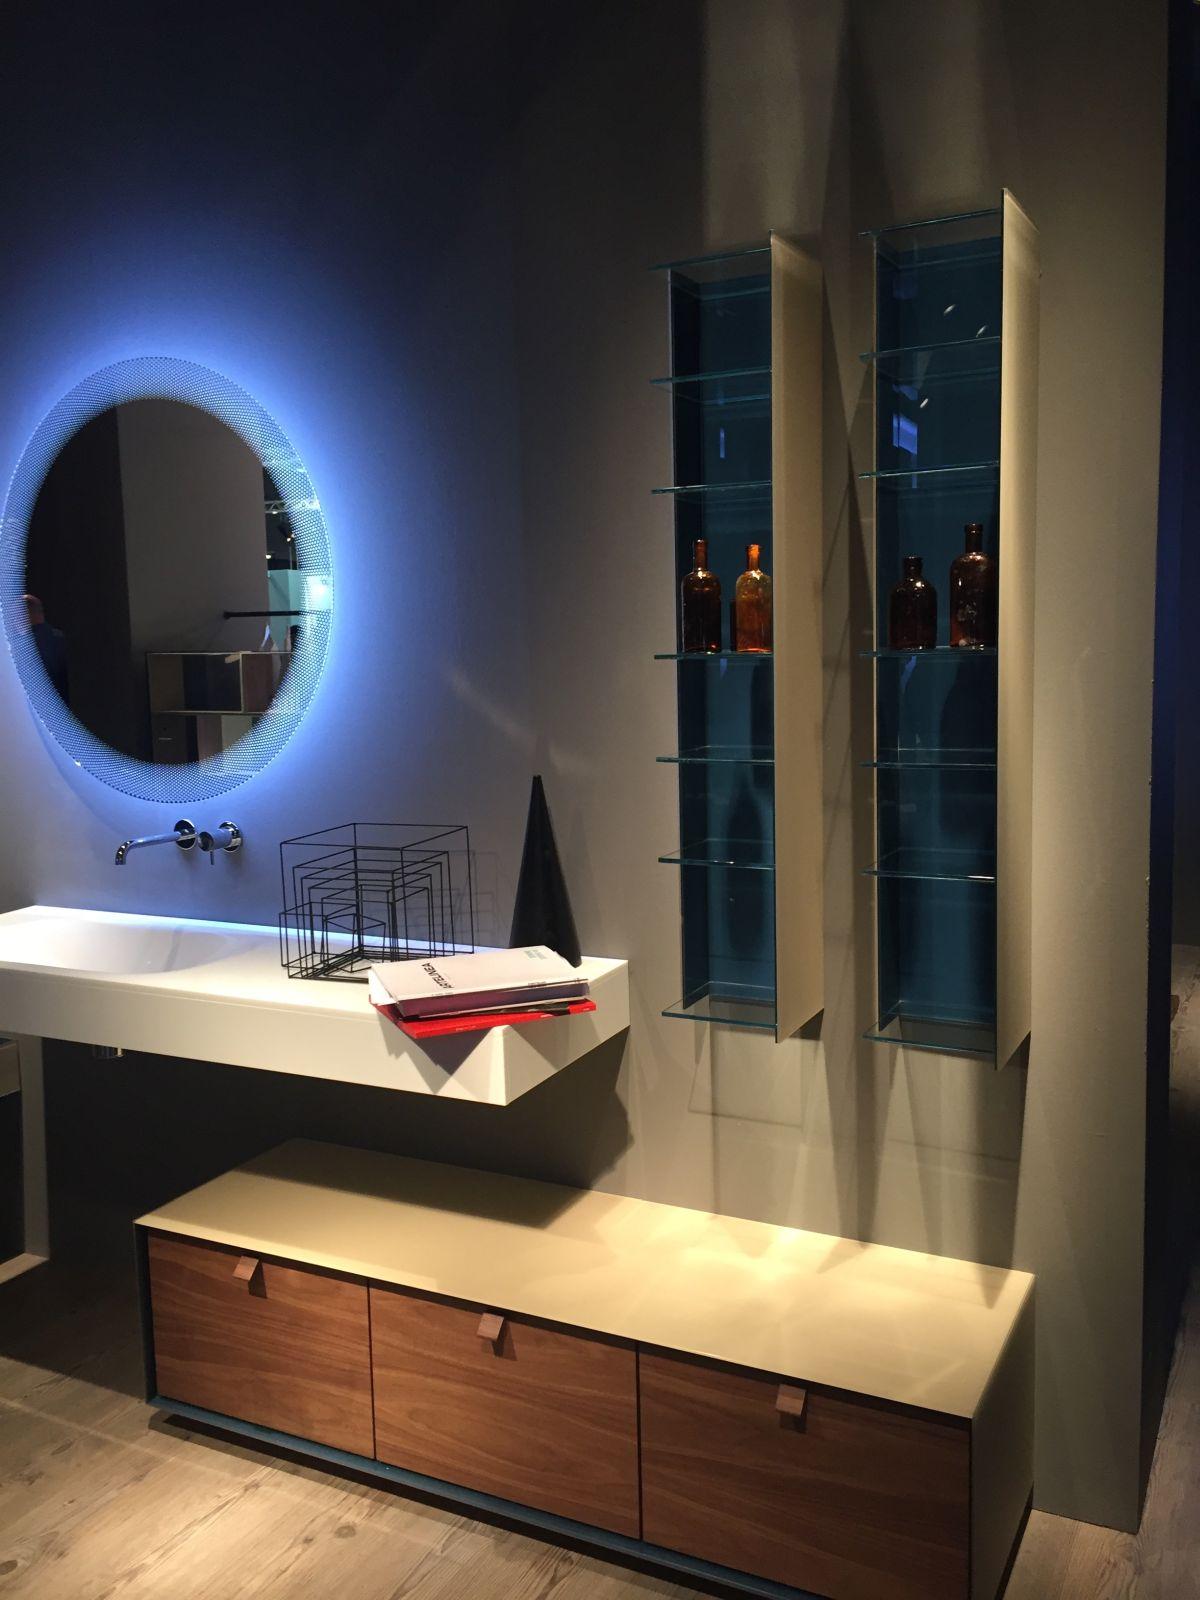 Artelinea bathroom design with mirror and vertical storage